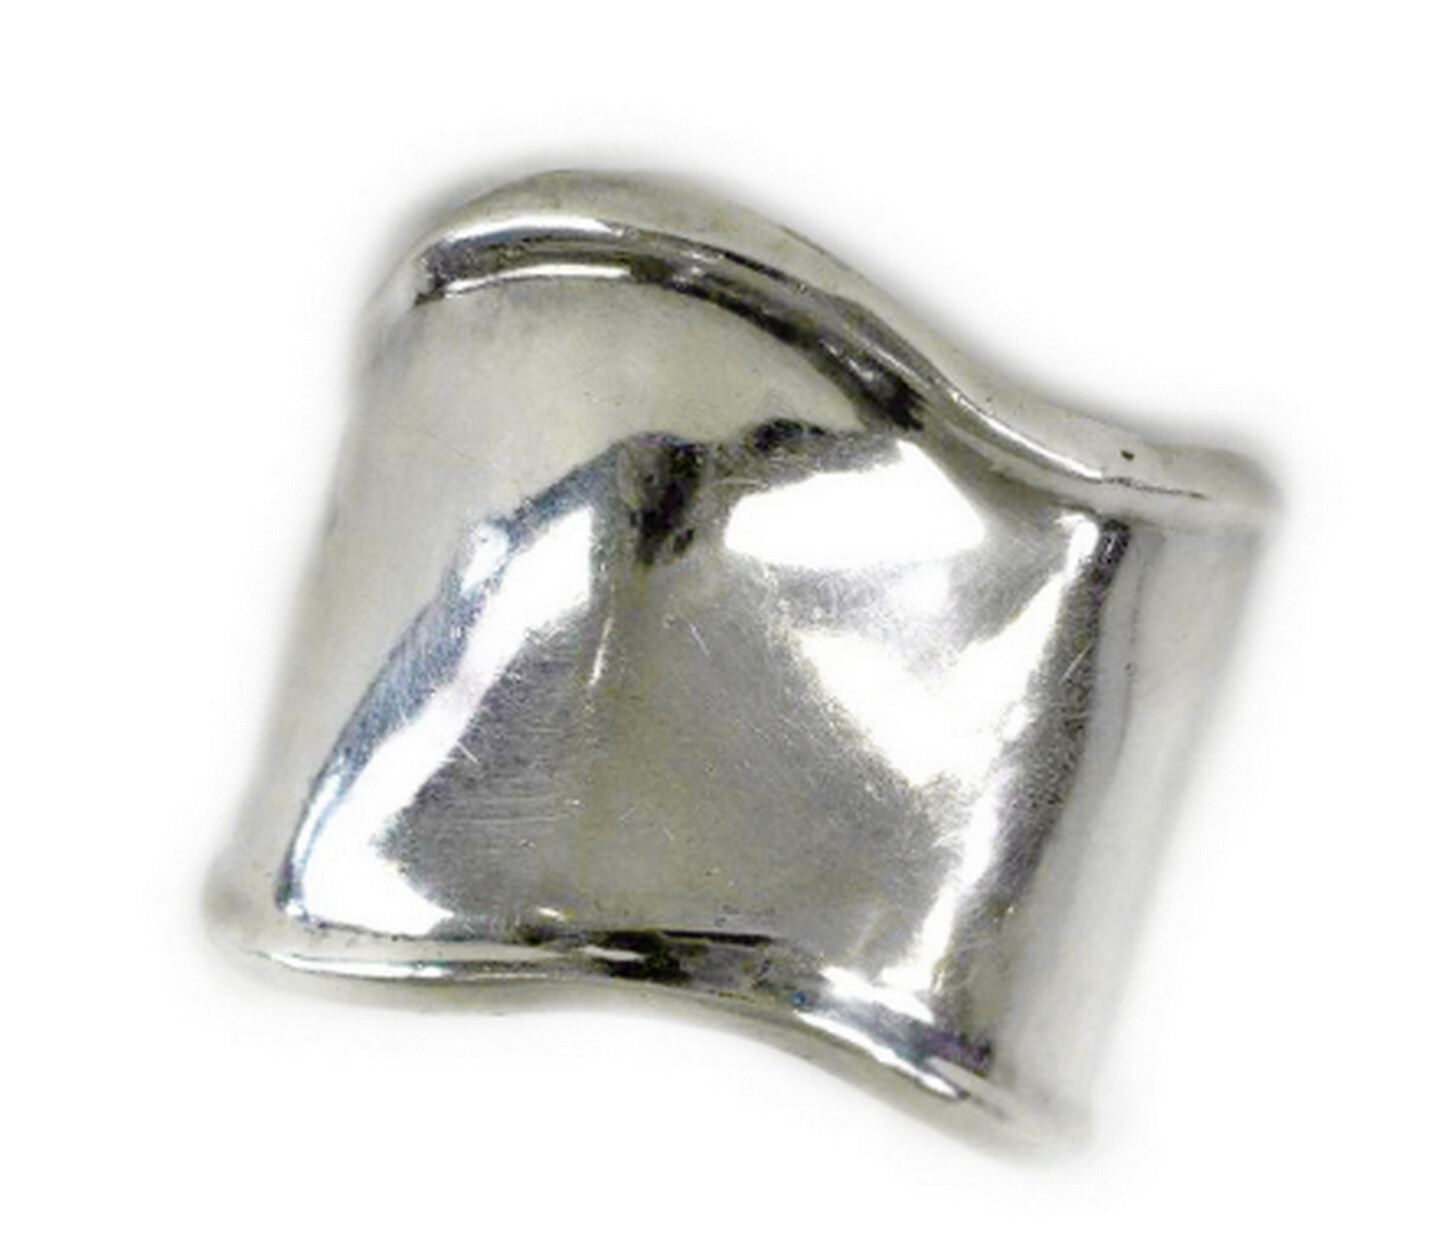 VTG Taxco Wide Silver Contoured Bone Cuff Bracelet